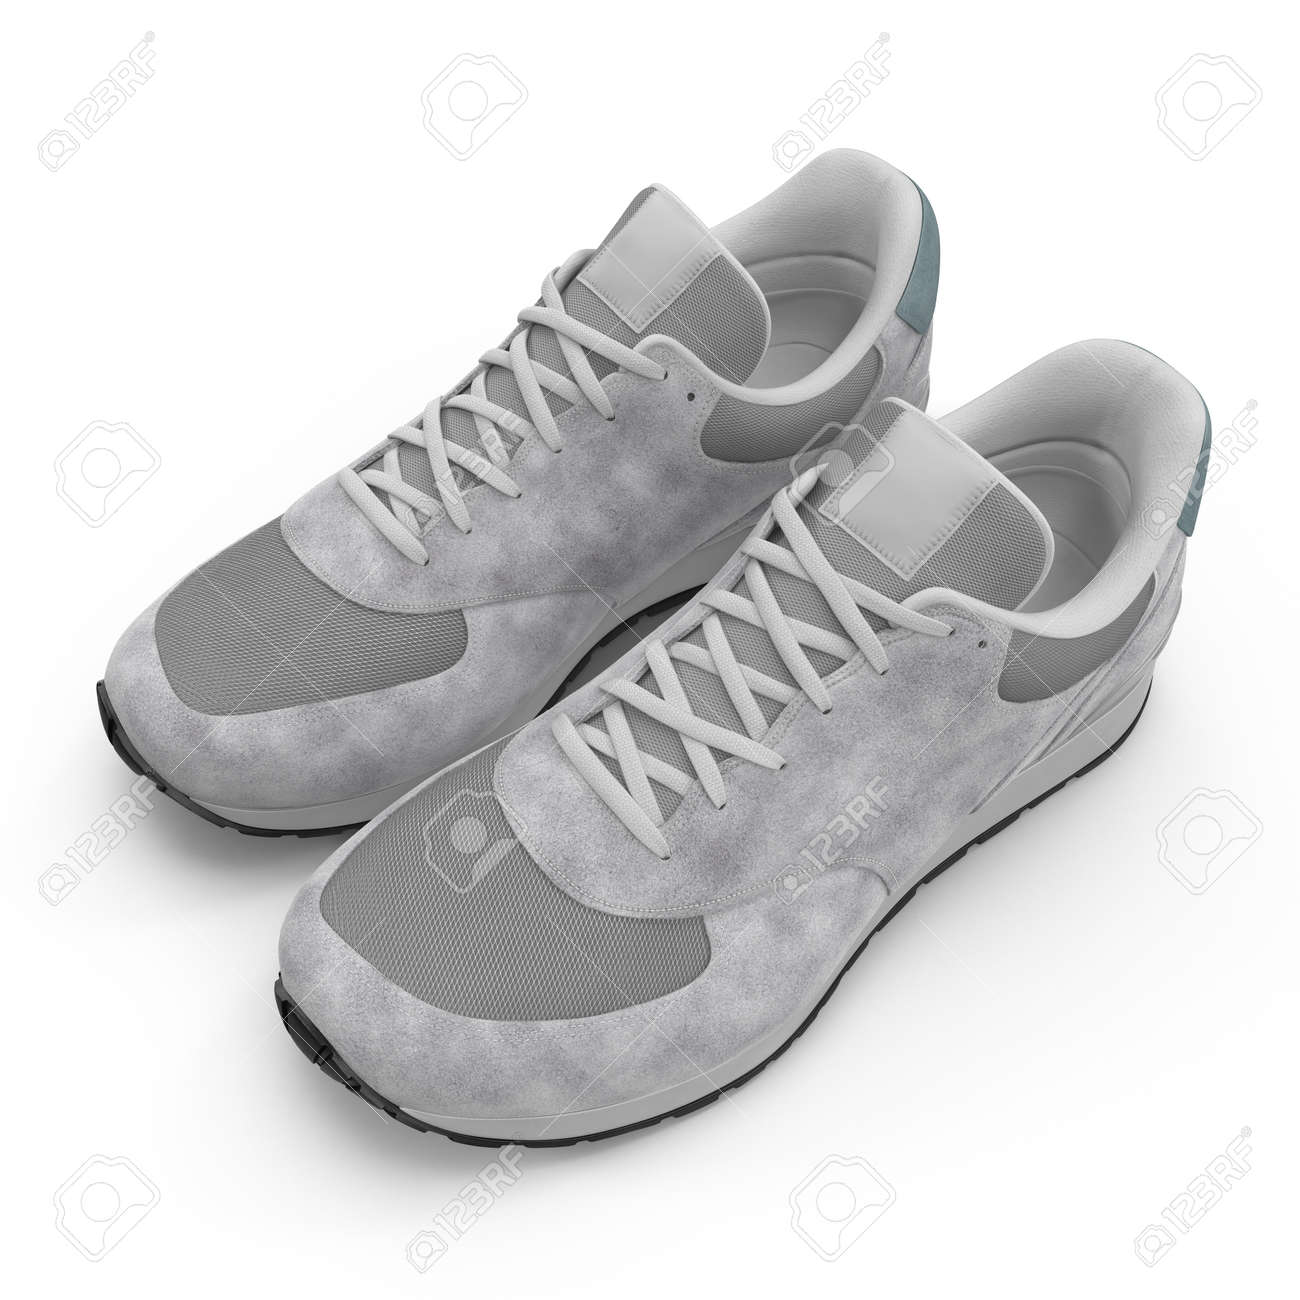 57cbaa9db4e82 Foto de archivo - Nueva zapato de running sin marca